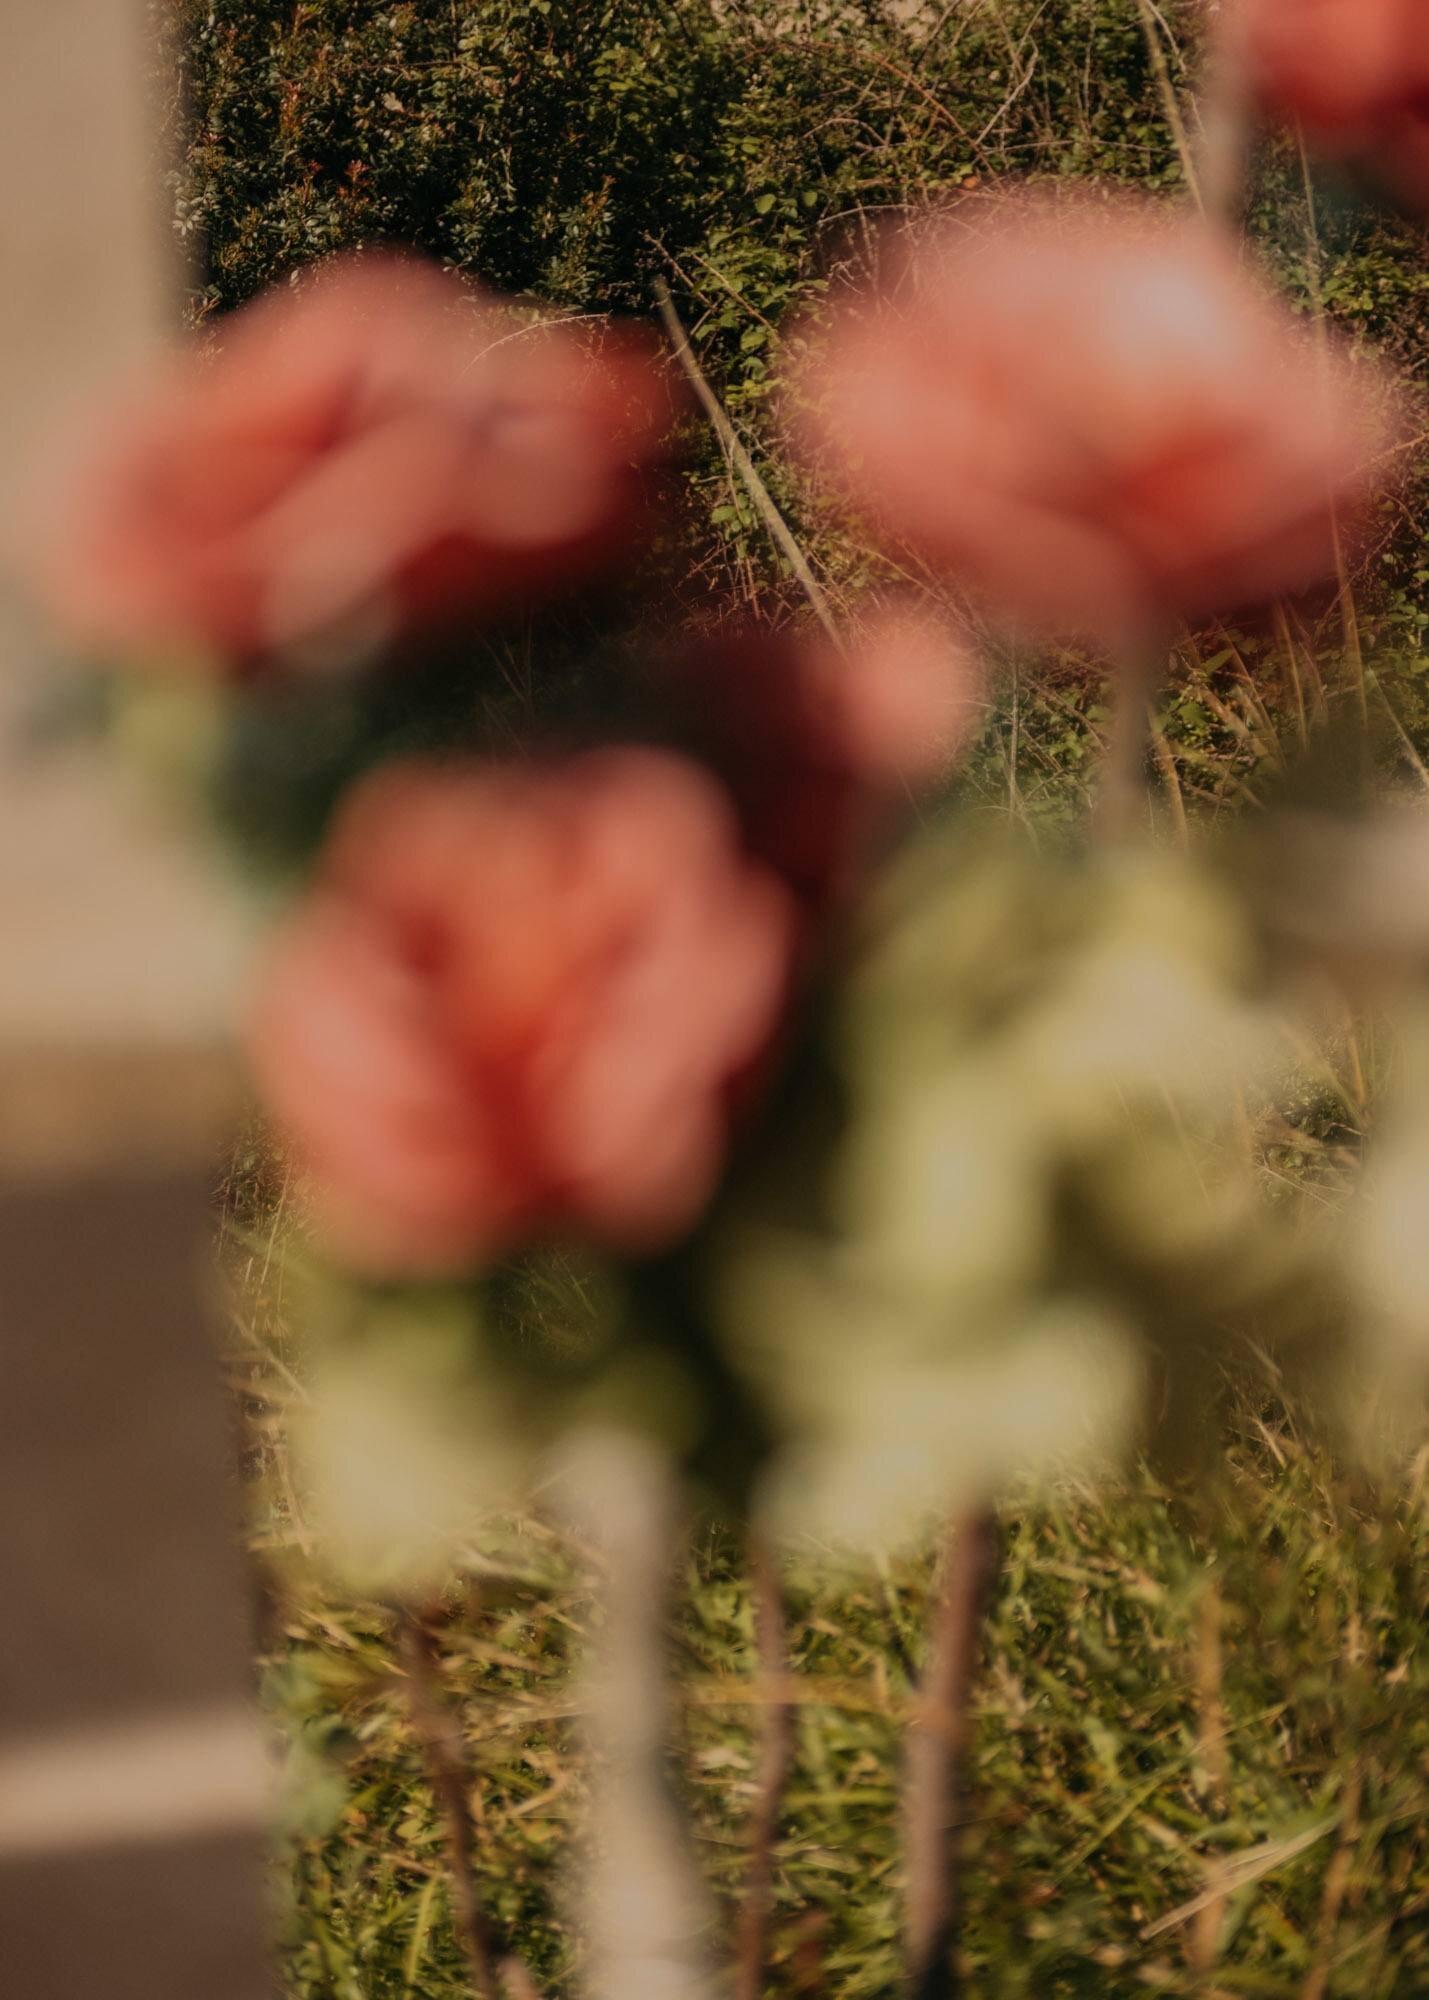 ignant-photography-maximilian-virgili-sardinia-8.jpg